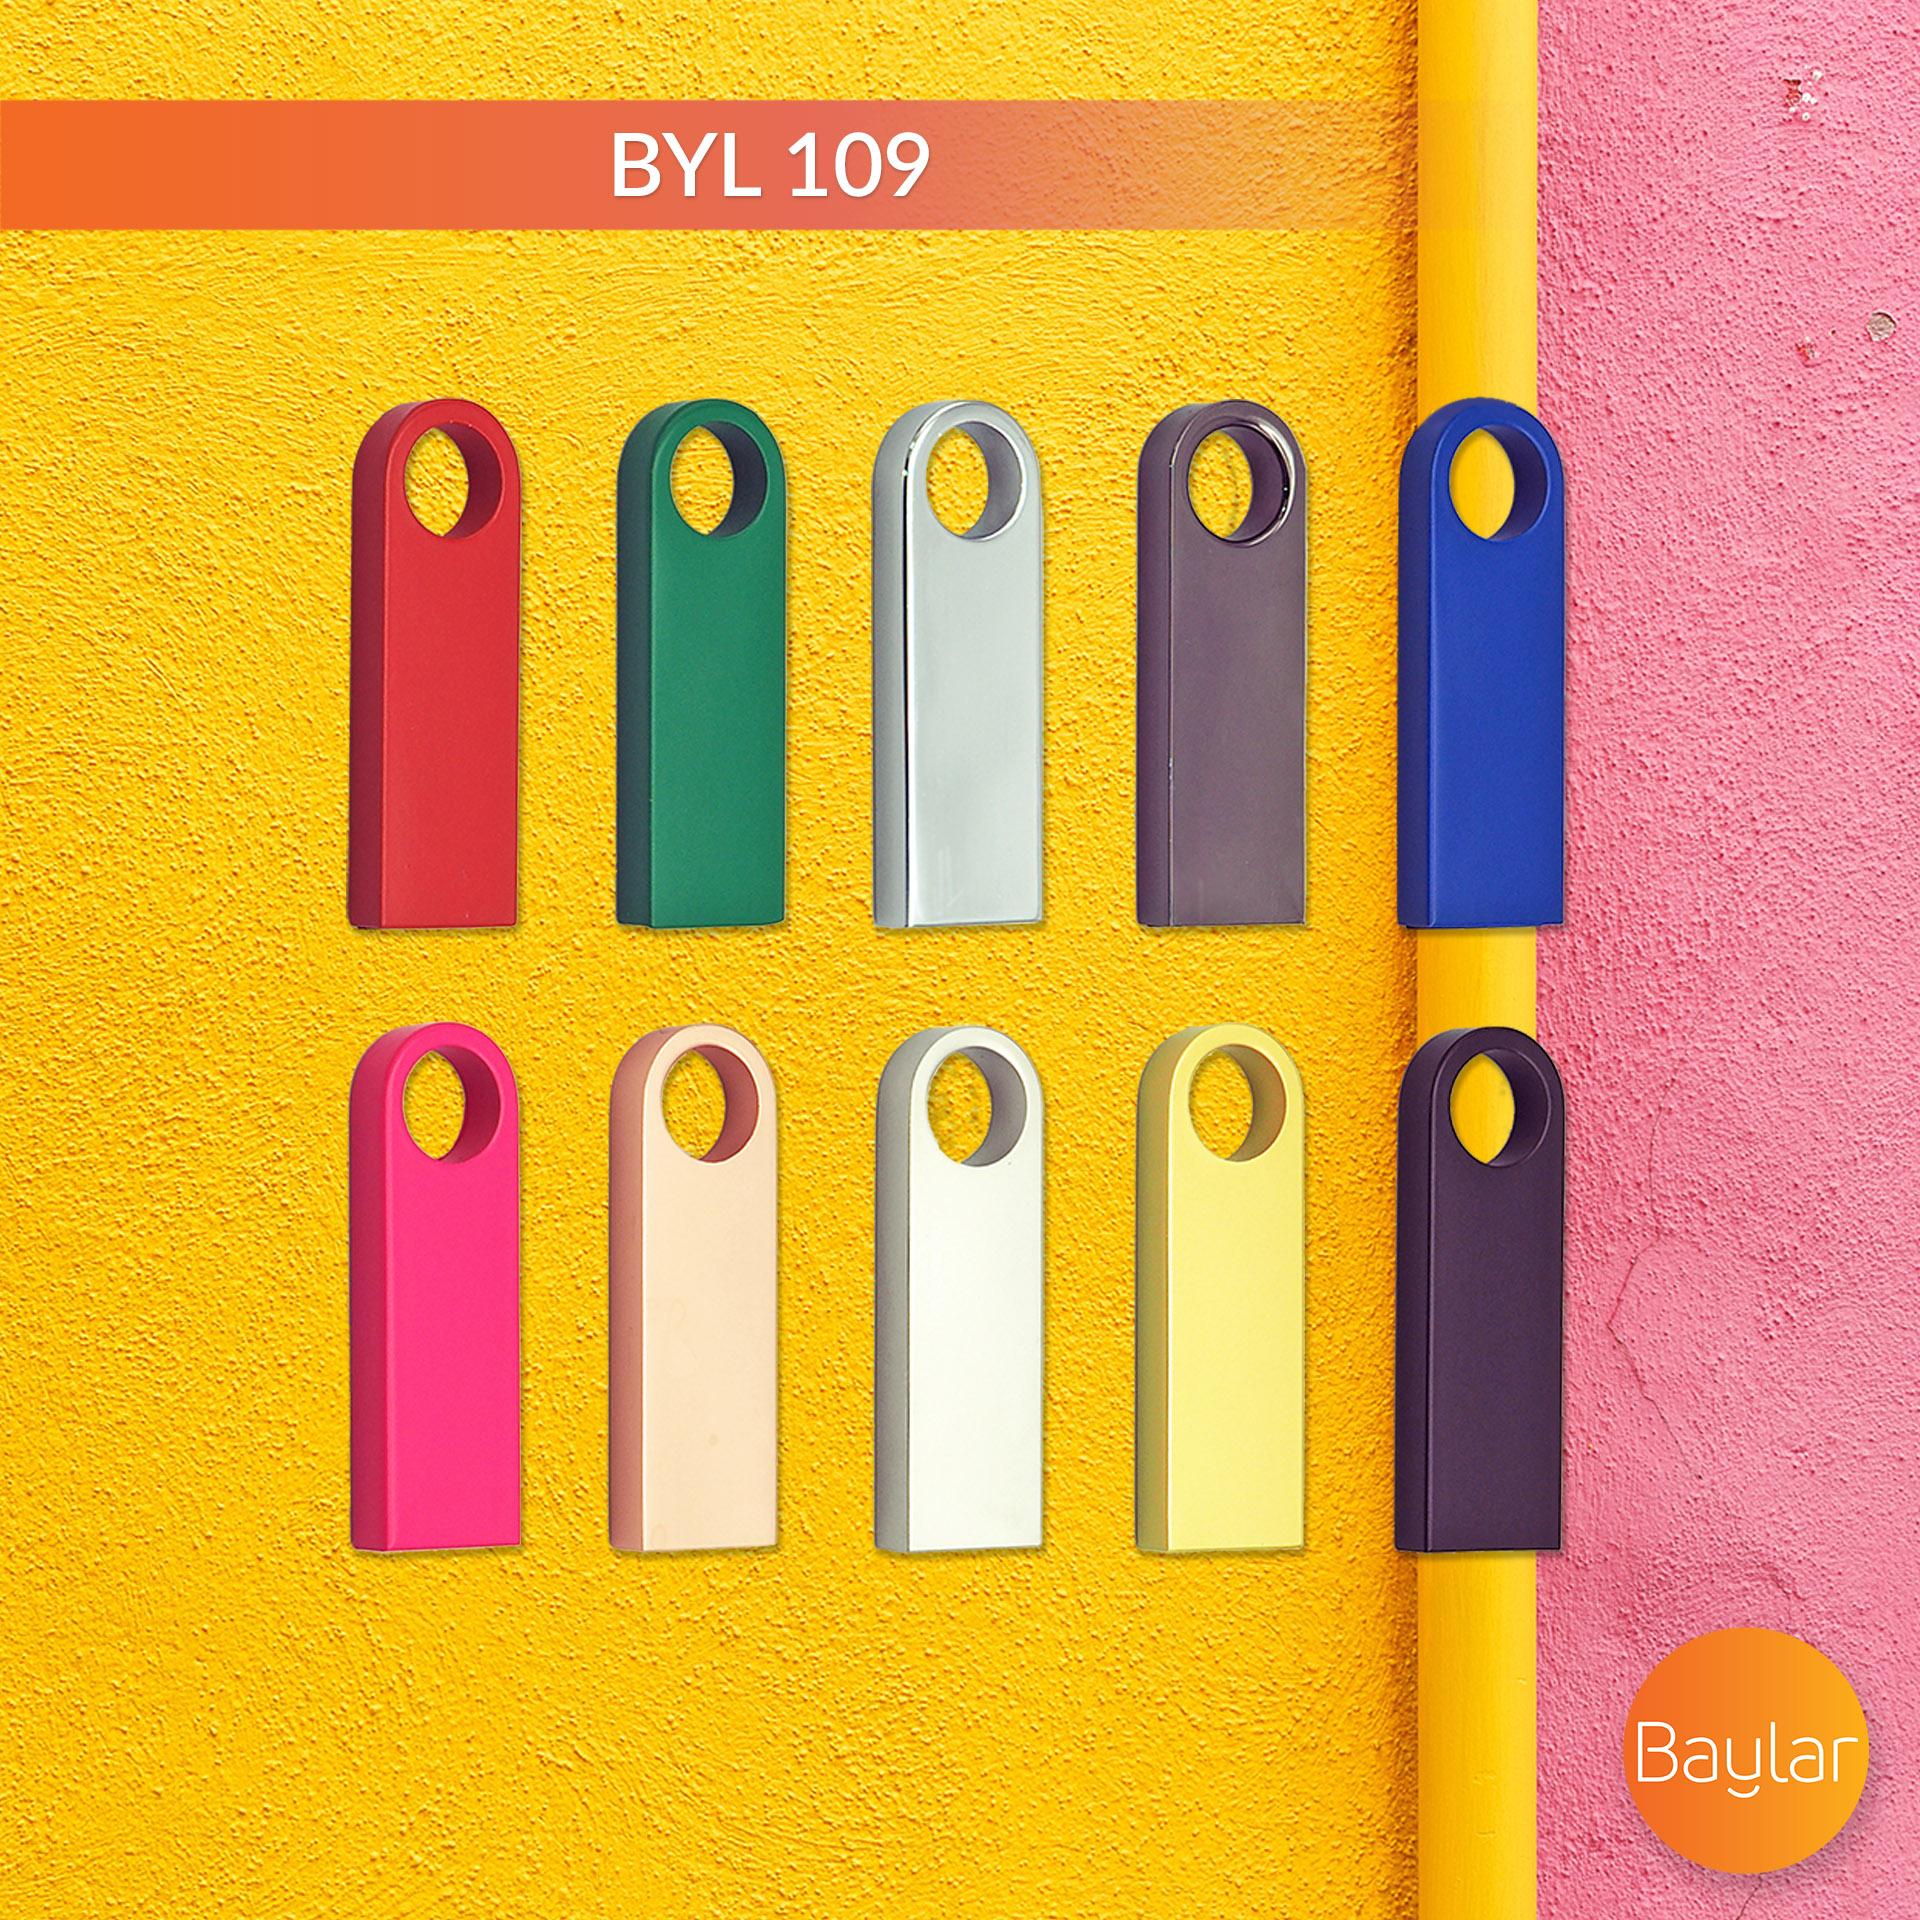 BYL 109 - USB Flash Drive